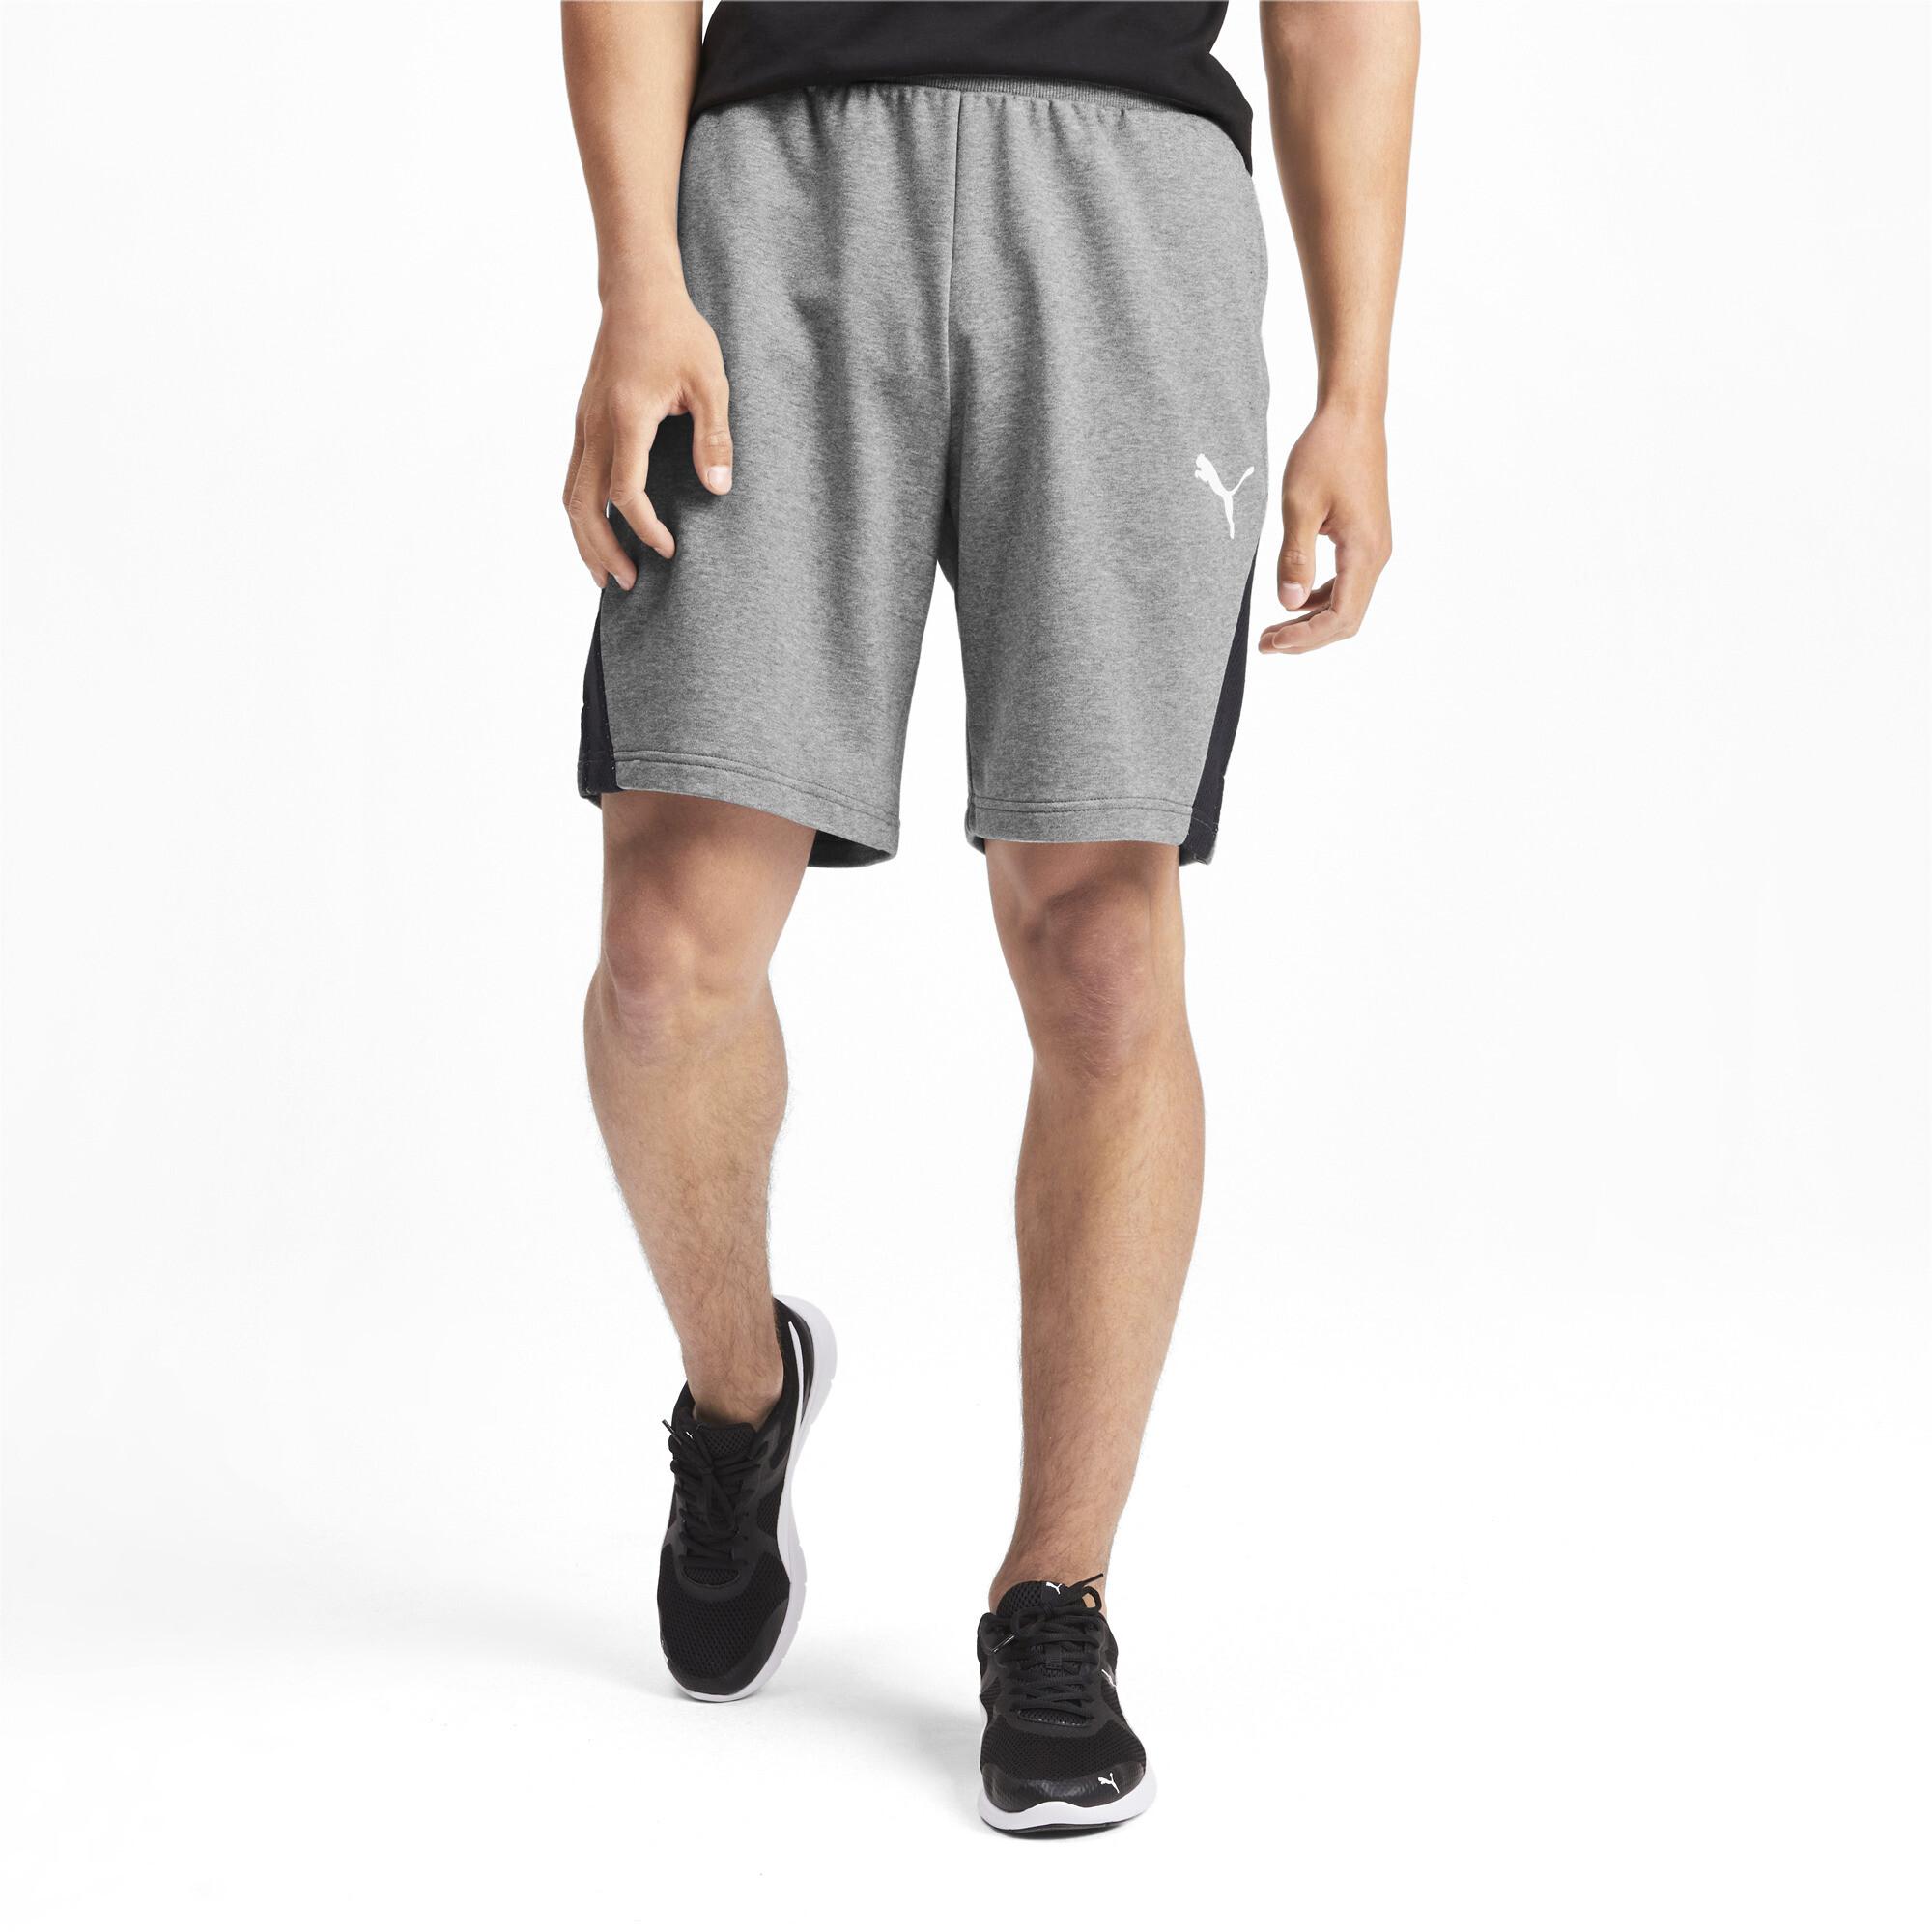 PUMA-Modern-Sports-Men-039-s-Shorts-Men-Knitted-Shorts-Basics thumbnail 9